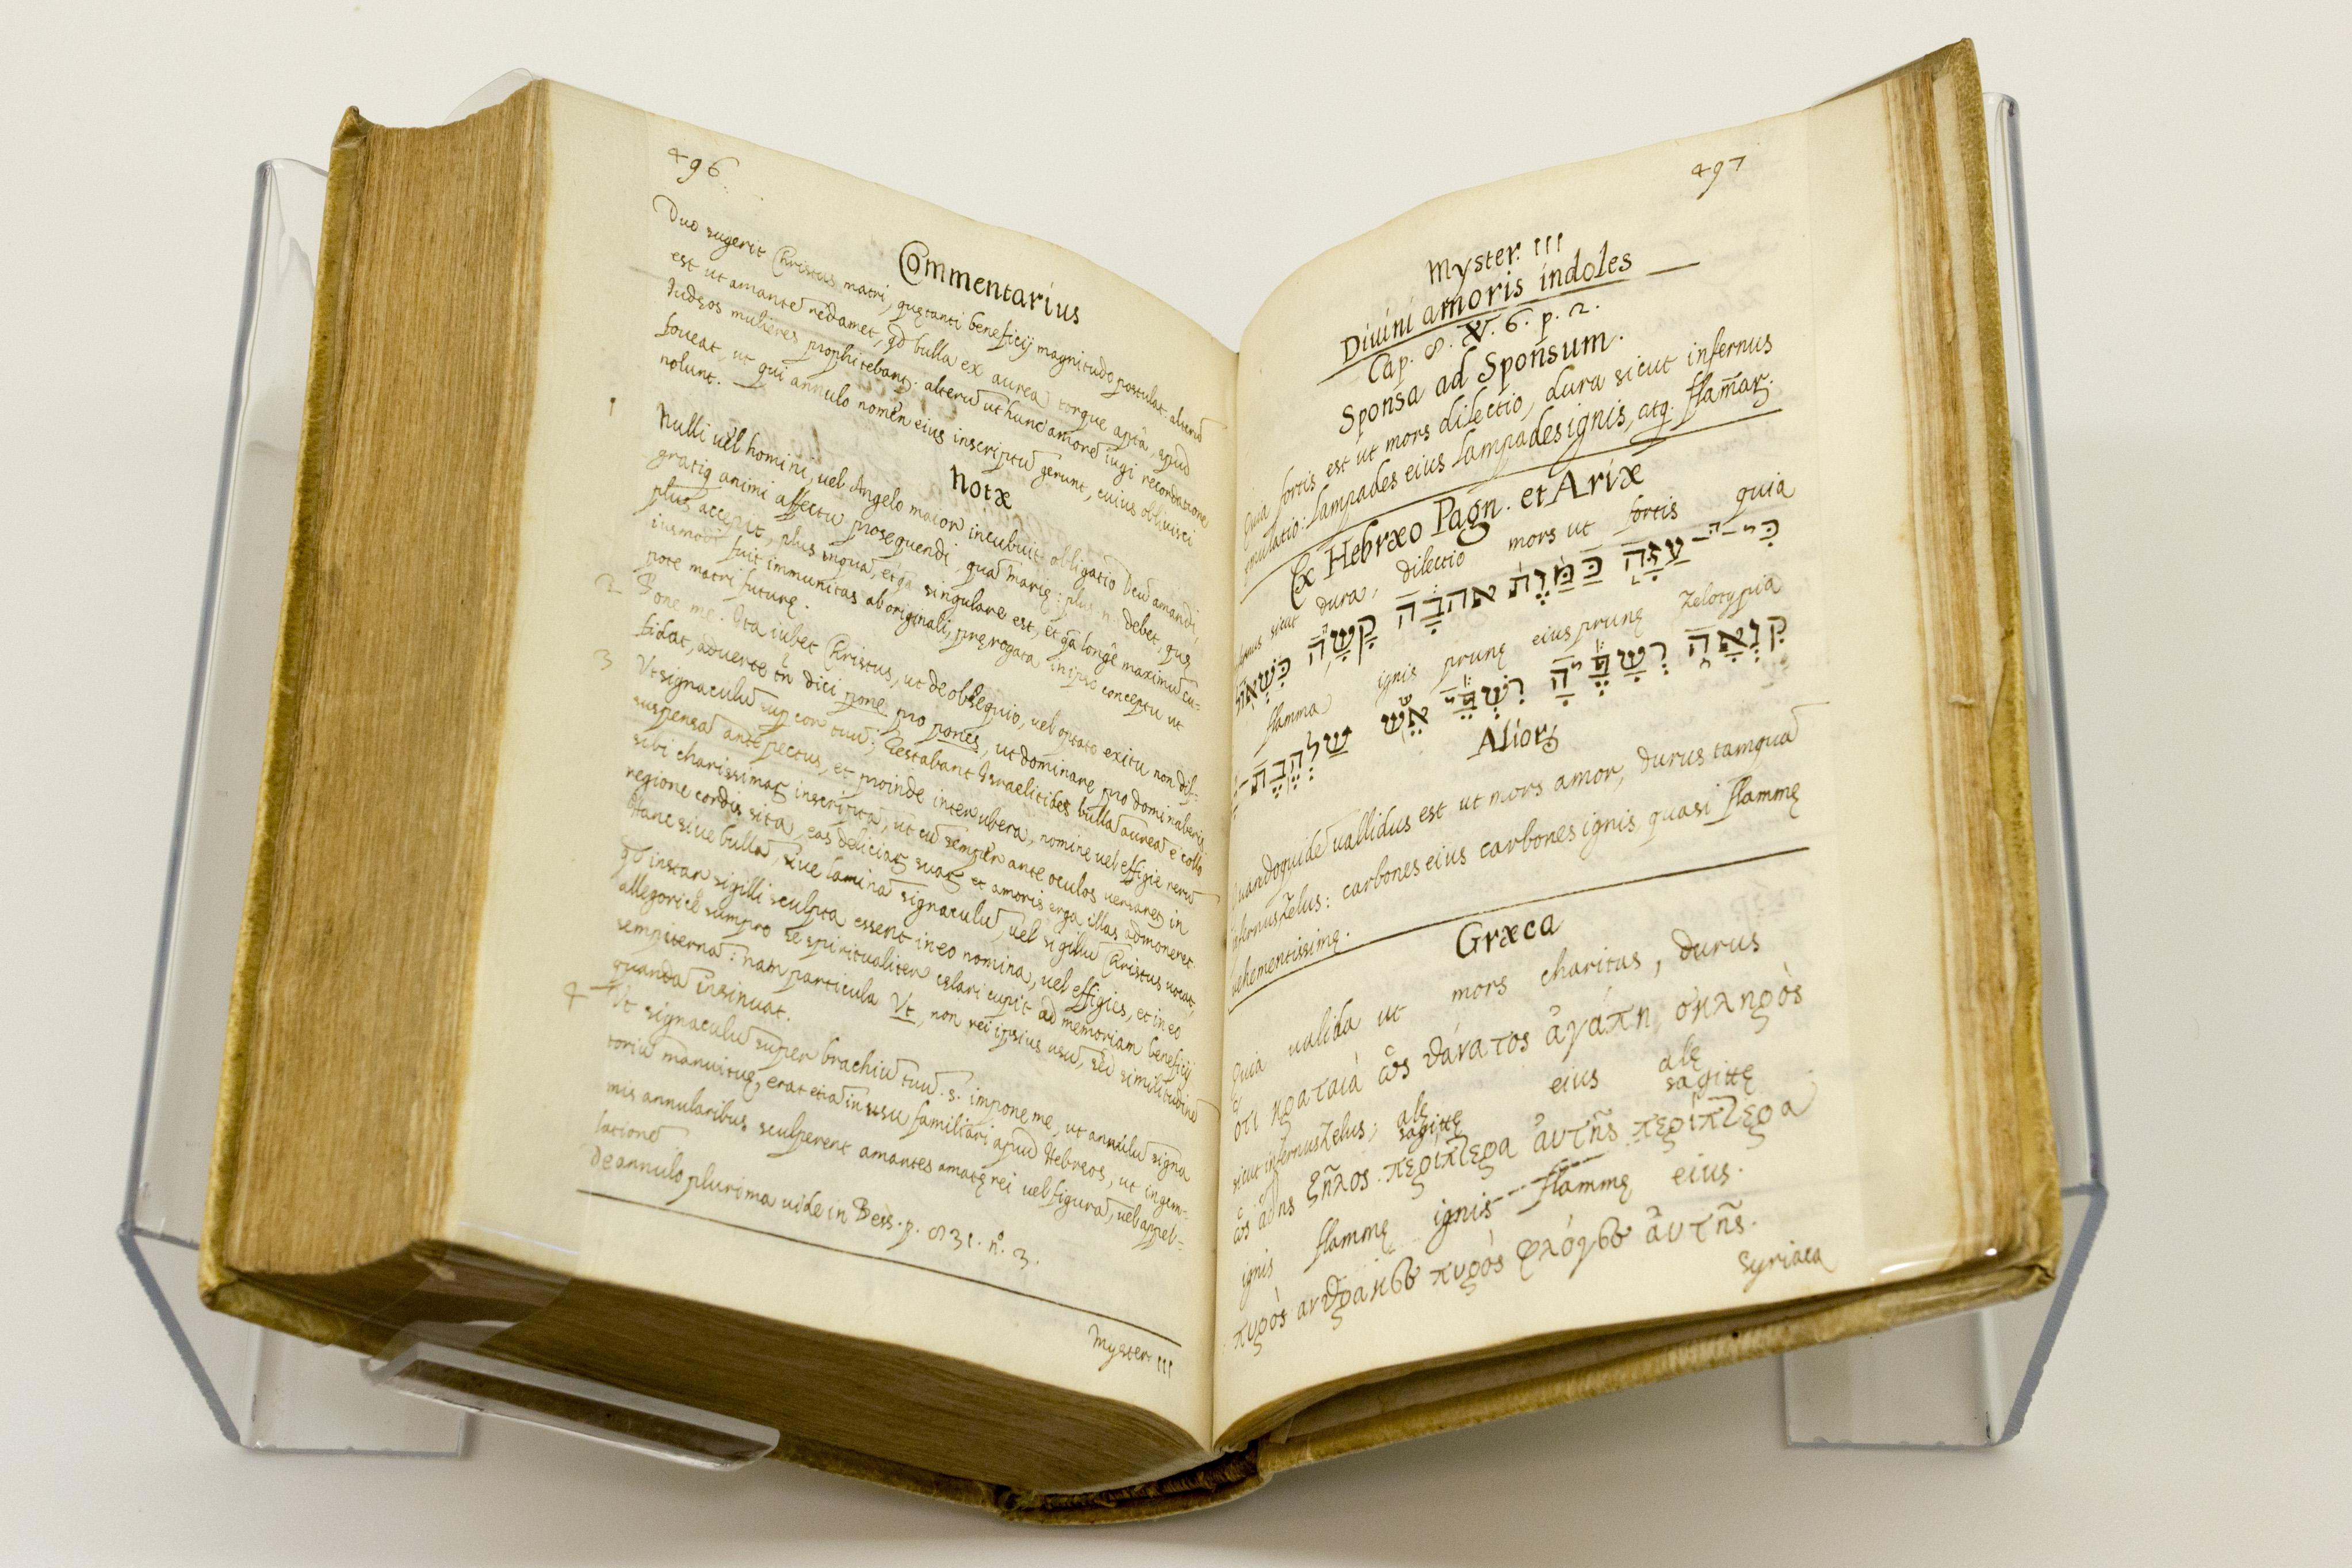 Biblioteca Universitaria di Bologna, Ebraici; ms. 4010